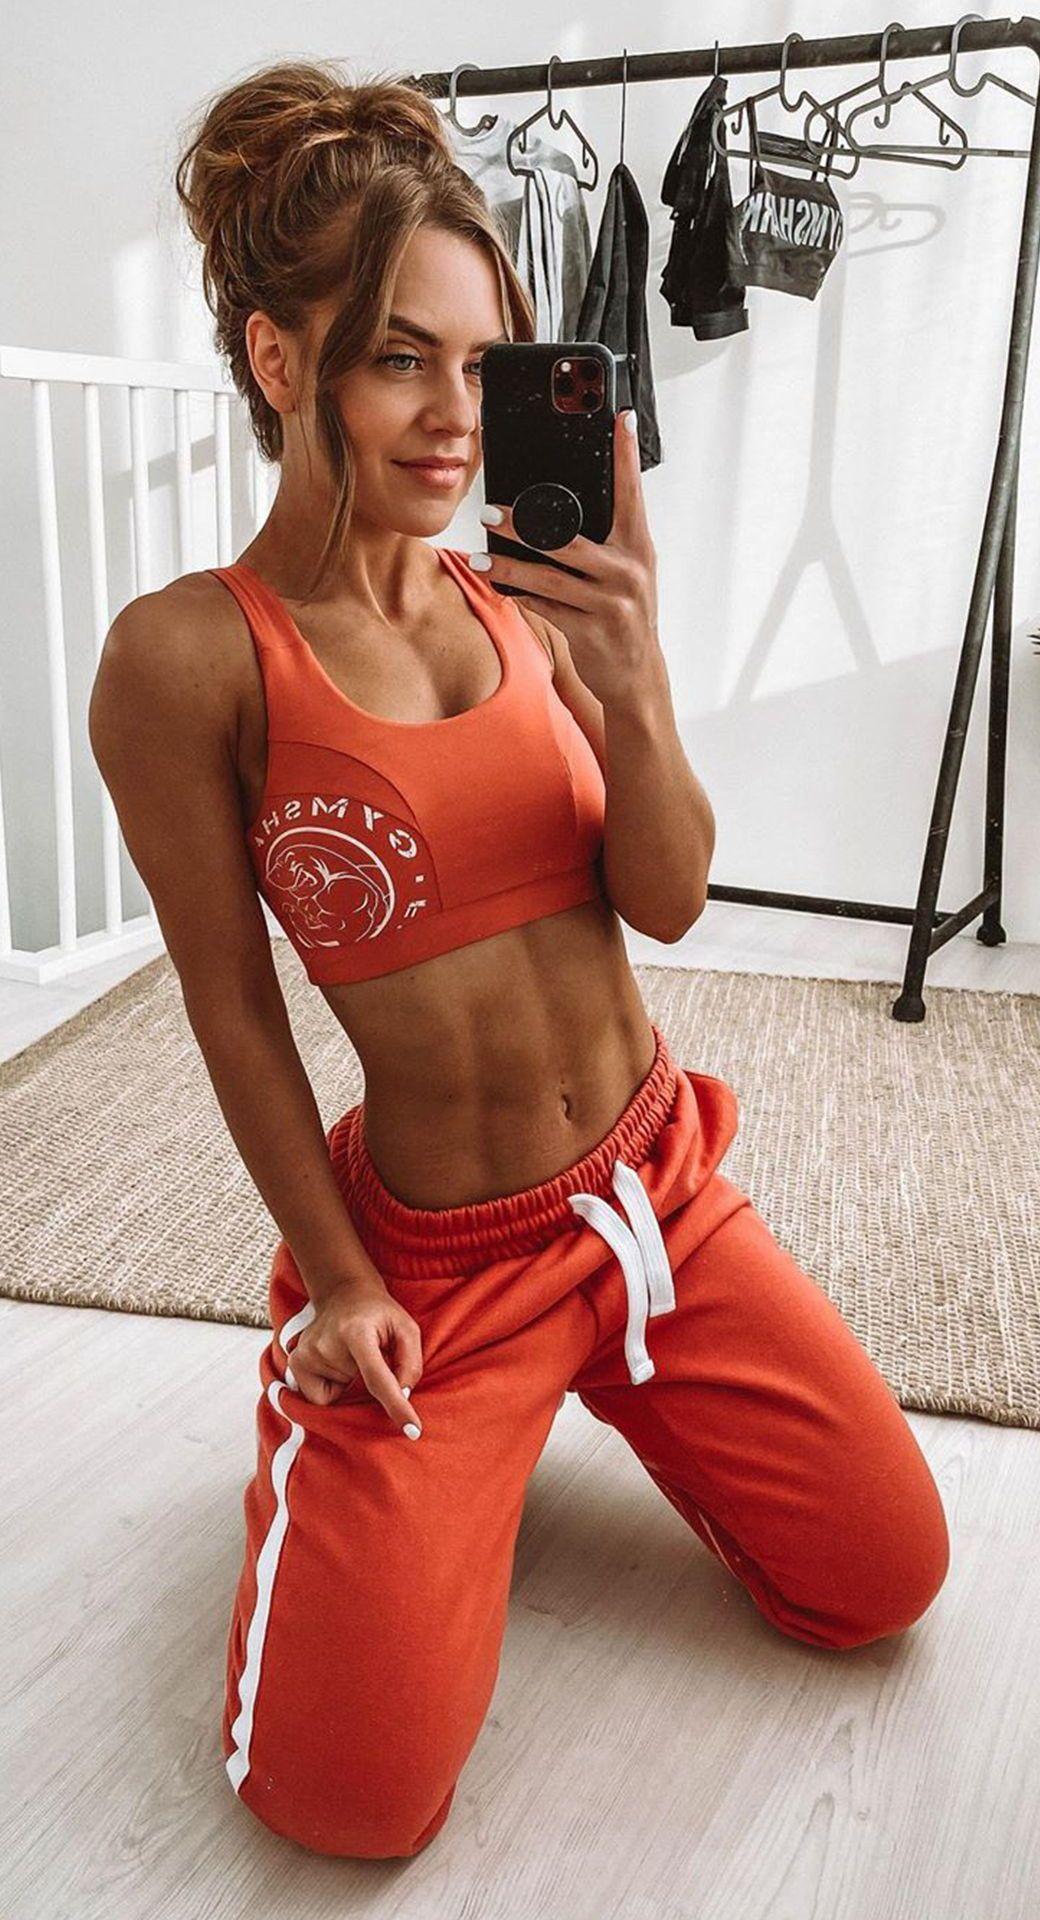 Gymshark | Legacy #spiritualawakening From squat racks to benches, the Legacy Fitness Bralette is bu...